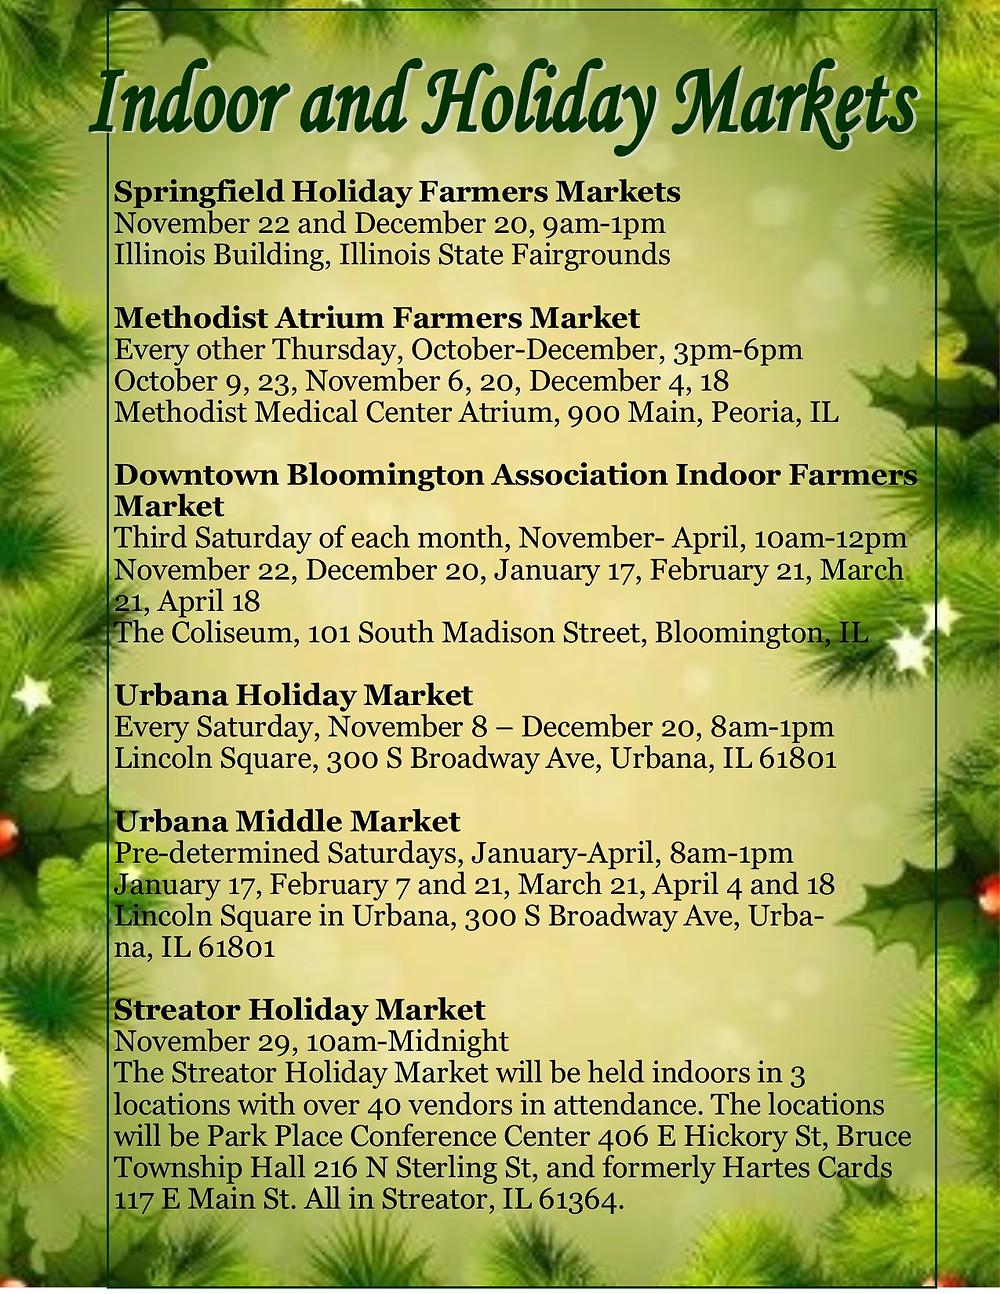 Indoor and Holiday Markets.jpg